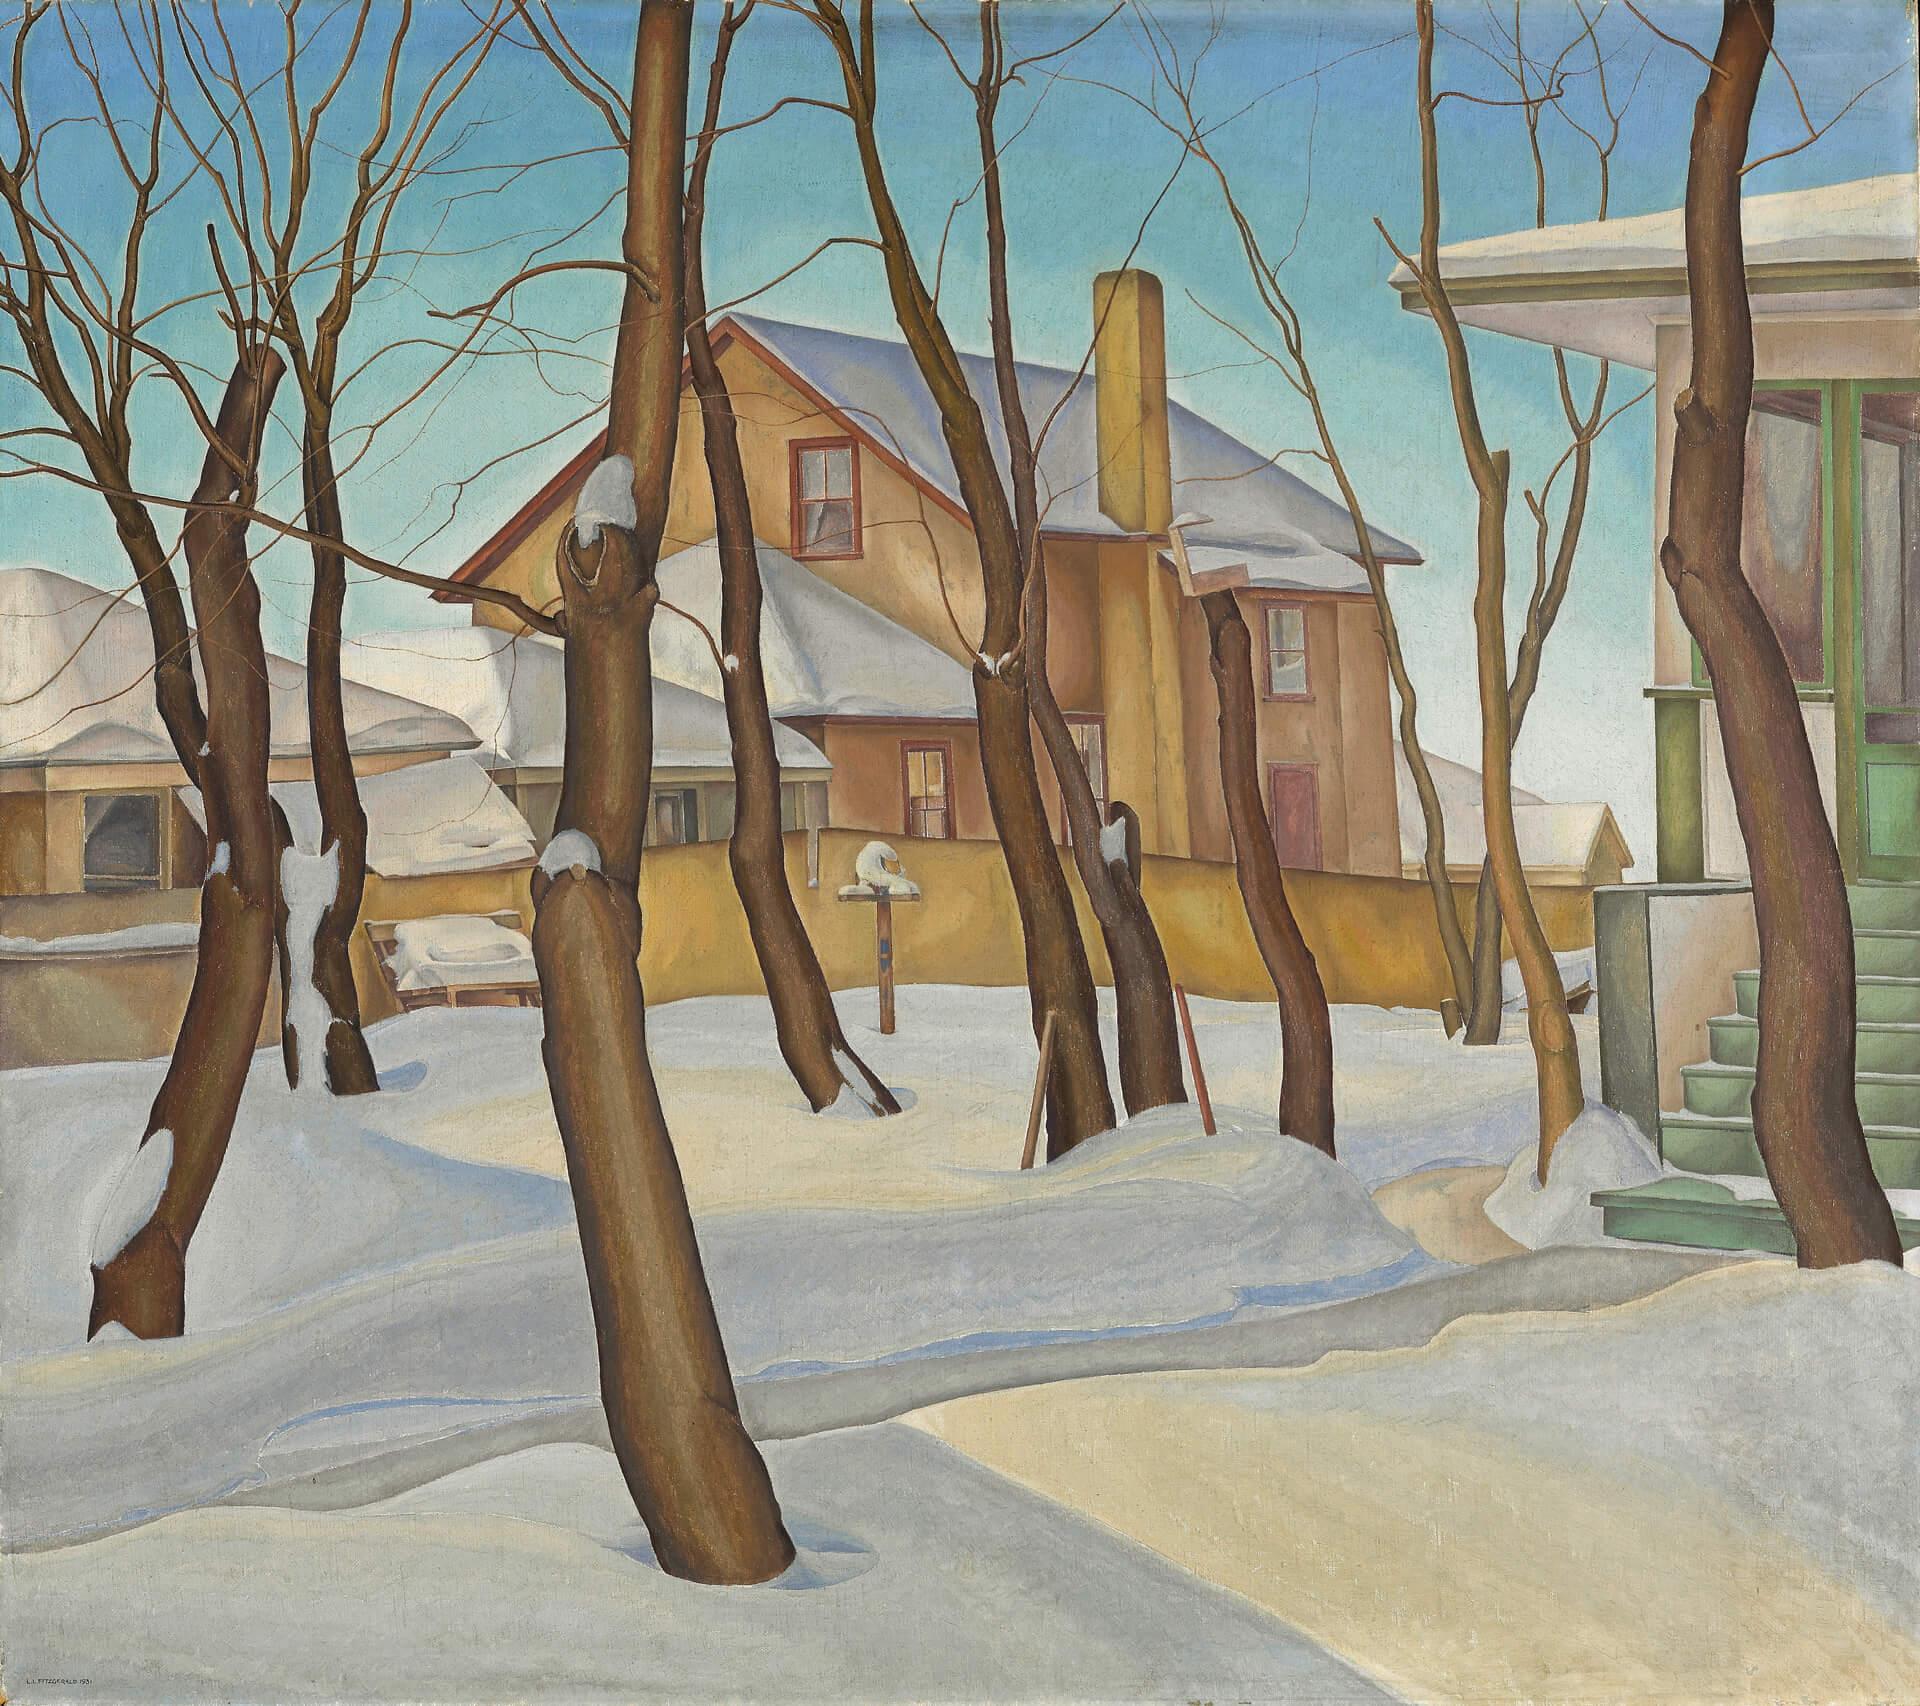 Lionel LeMoine FitzGerald, Doc Snyder's House, 1931